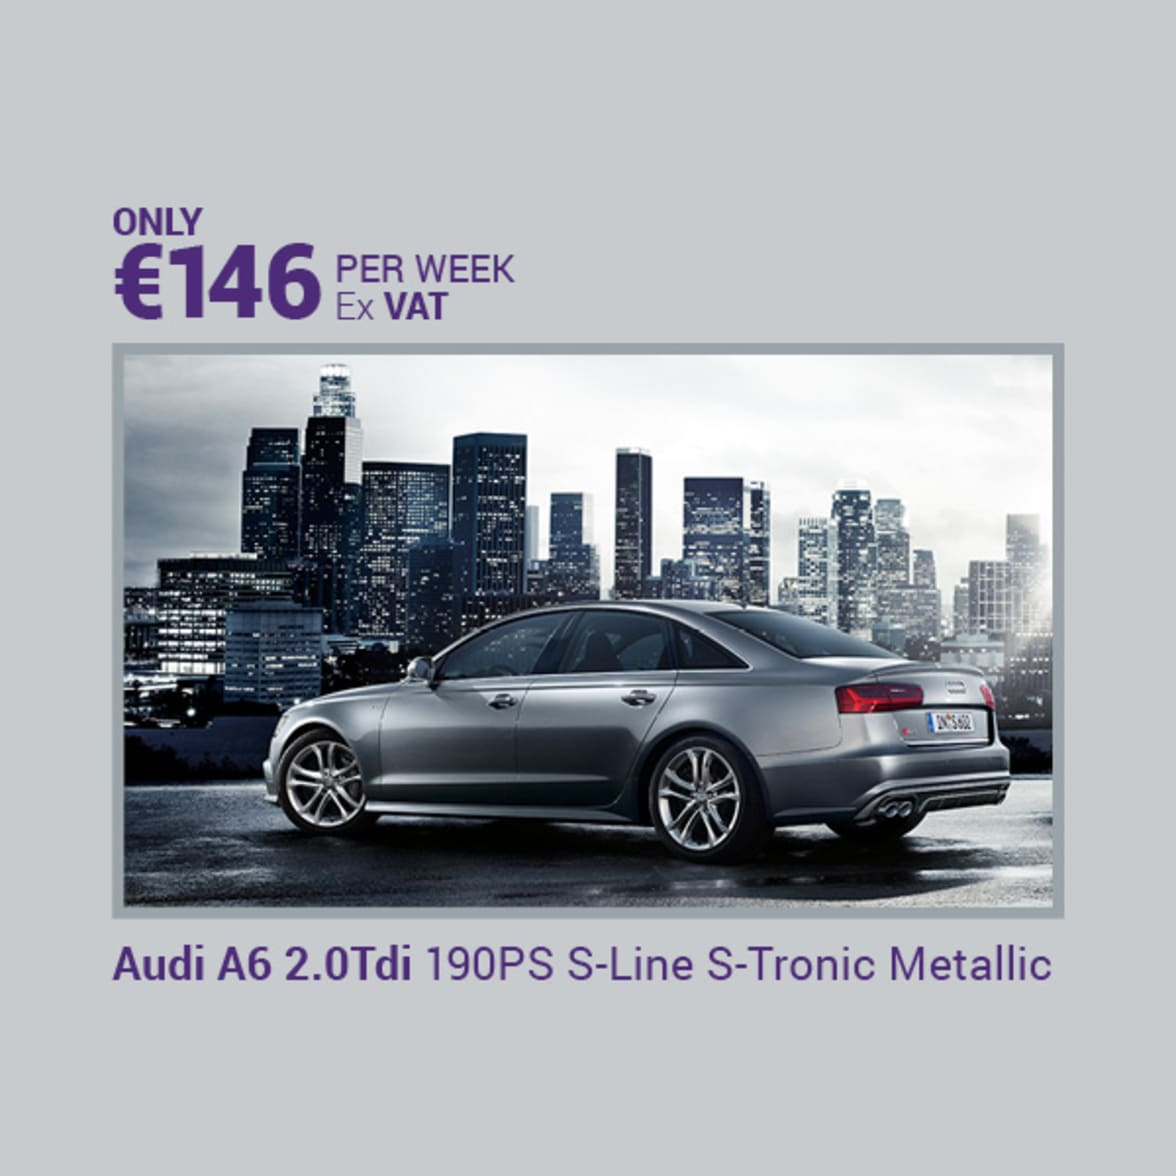 Joe Duffy Leasing Exclusive Audi Offers New Used Cars Dublin - Car leasing ireland audi